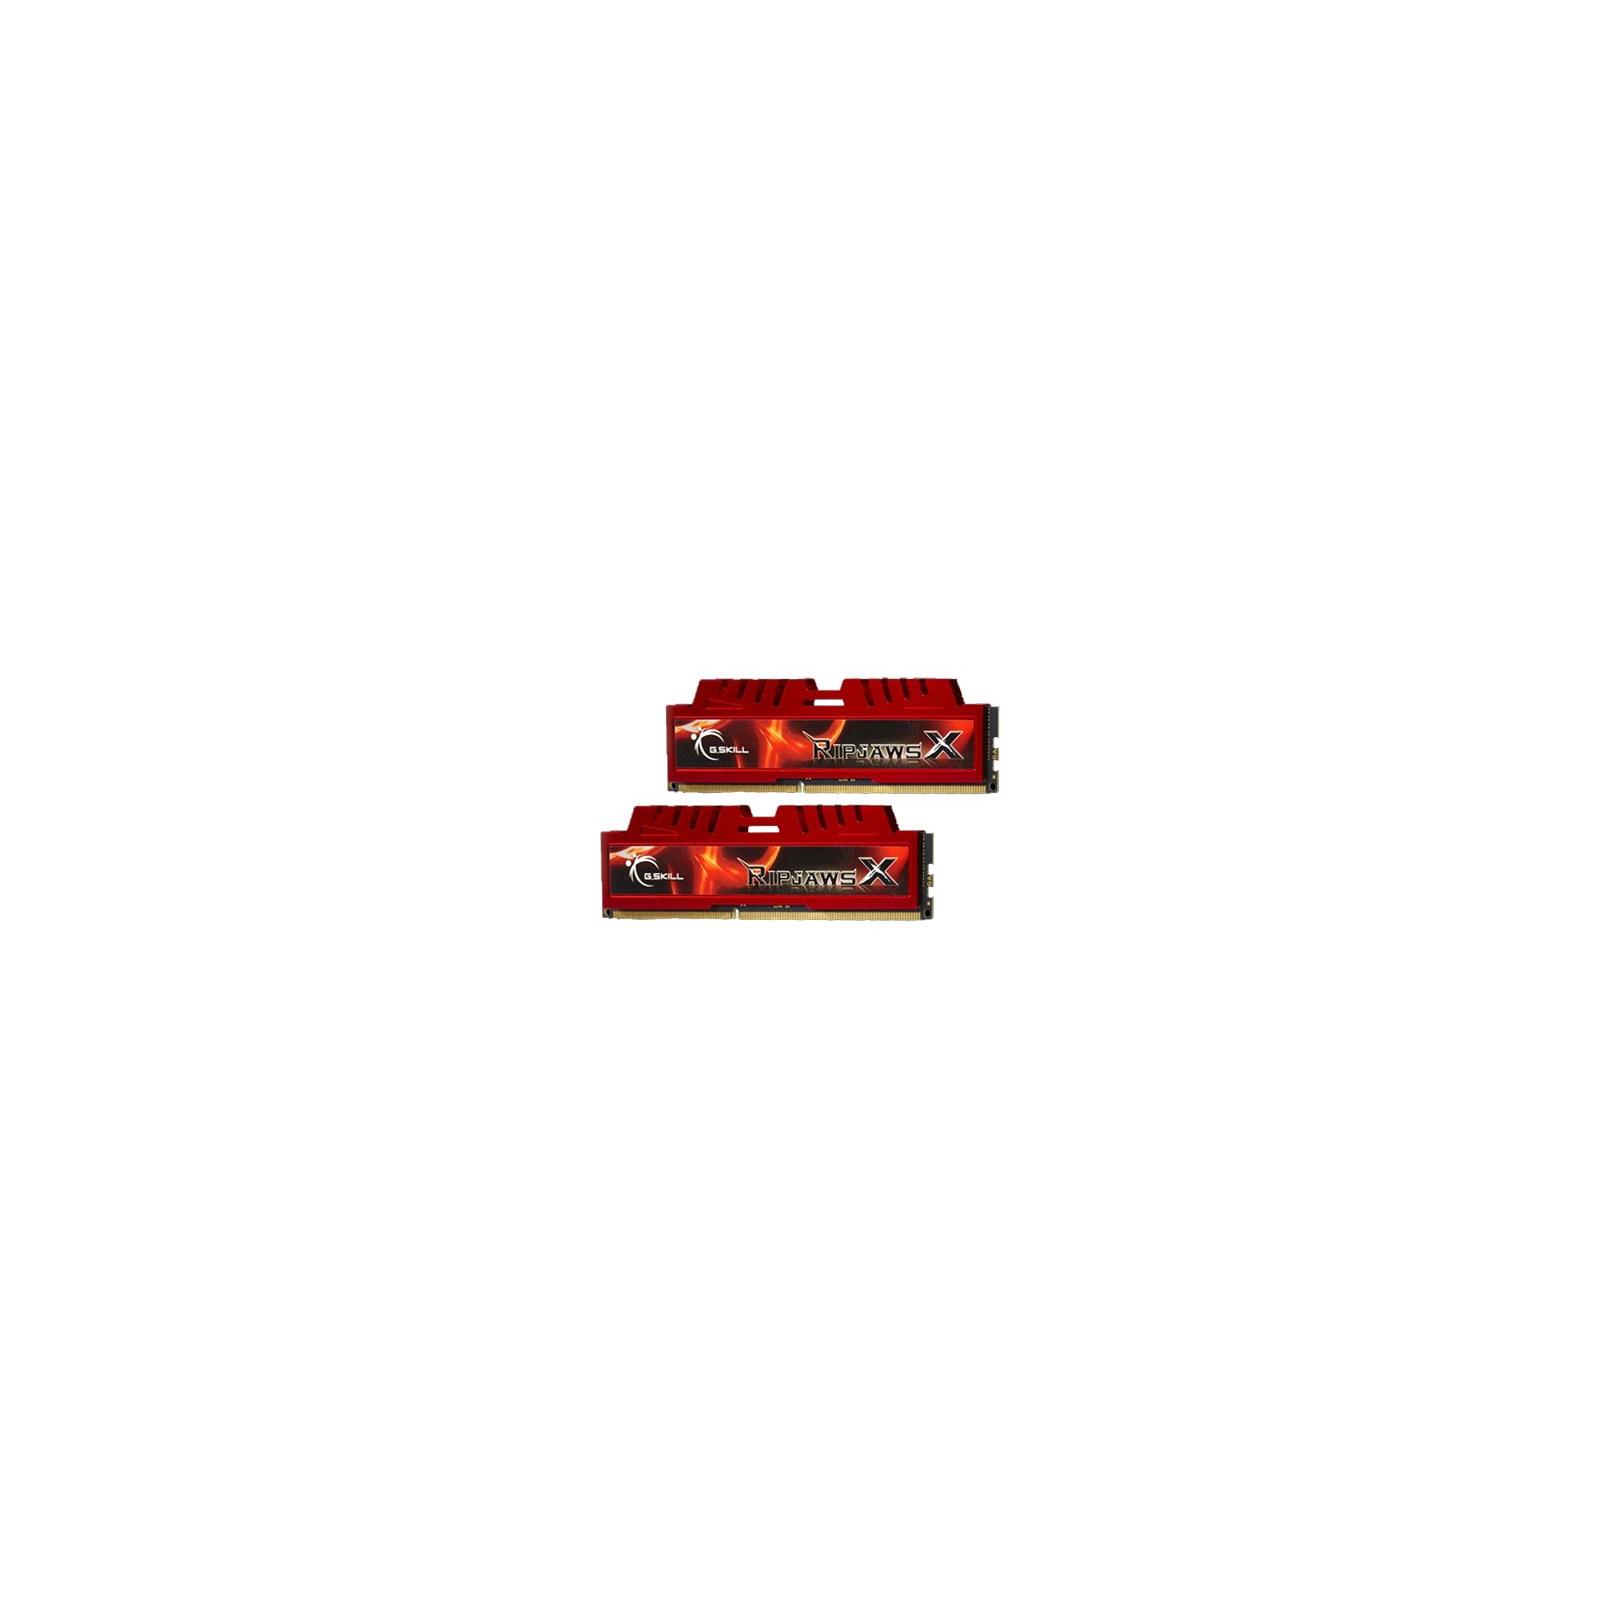 Модуль памяти для компьютера DDR3 16GB (2x8GB) 1333 MHz G.Skill (F3-10666CL9D-16GBXL)